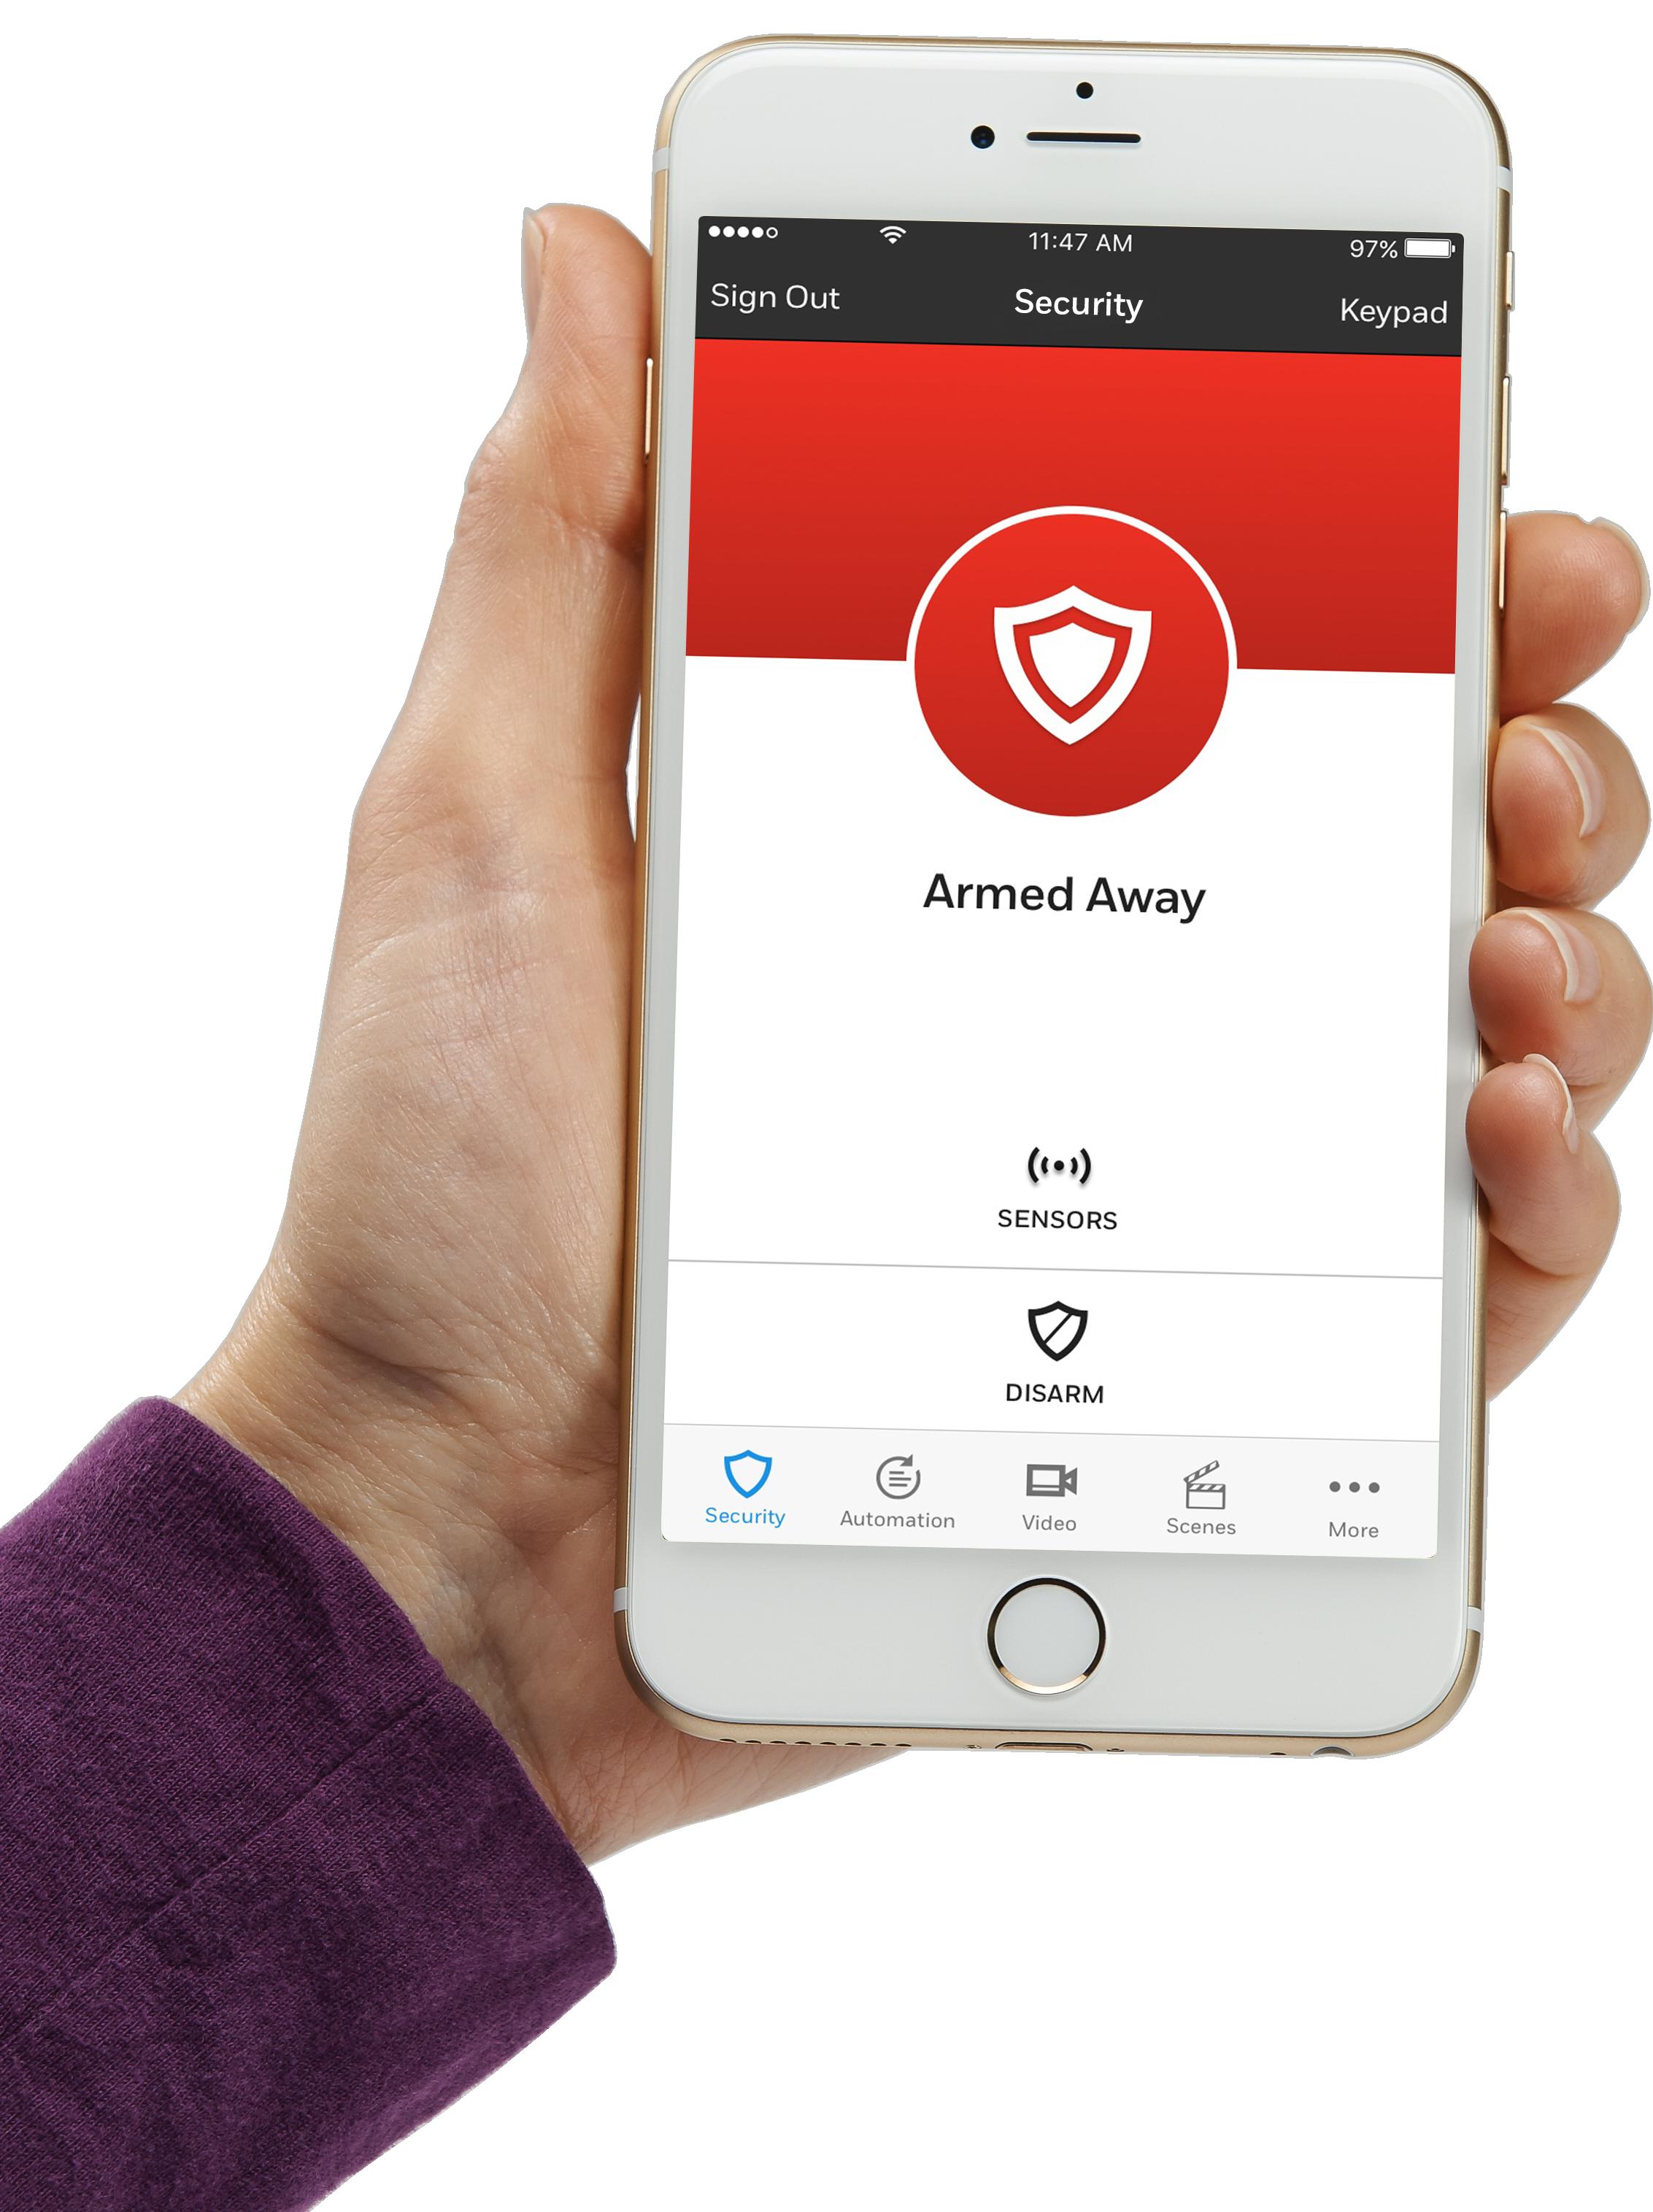 Apple-iPhone-Security-Armed-Away-2_hi